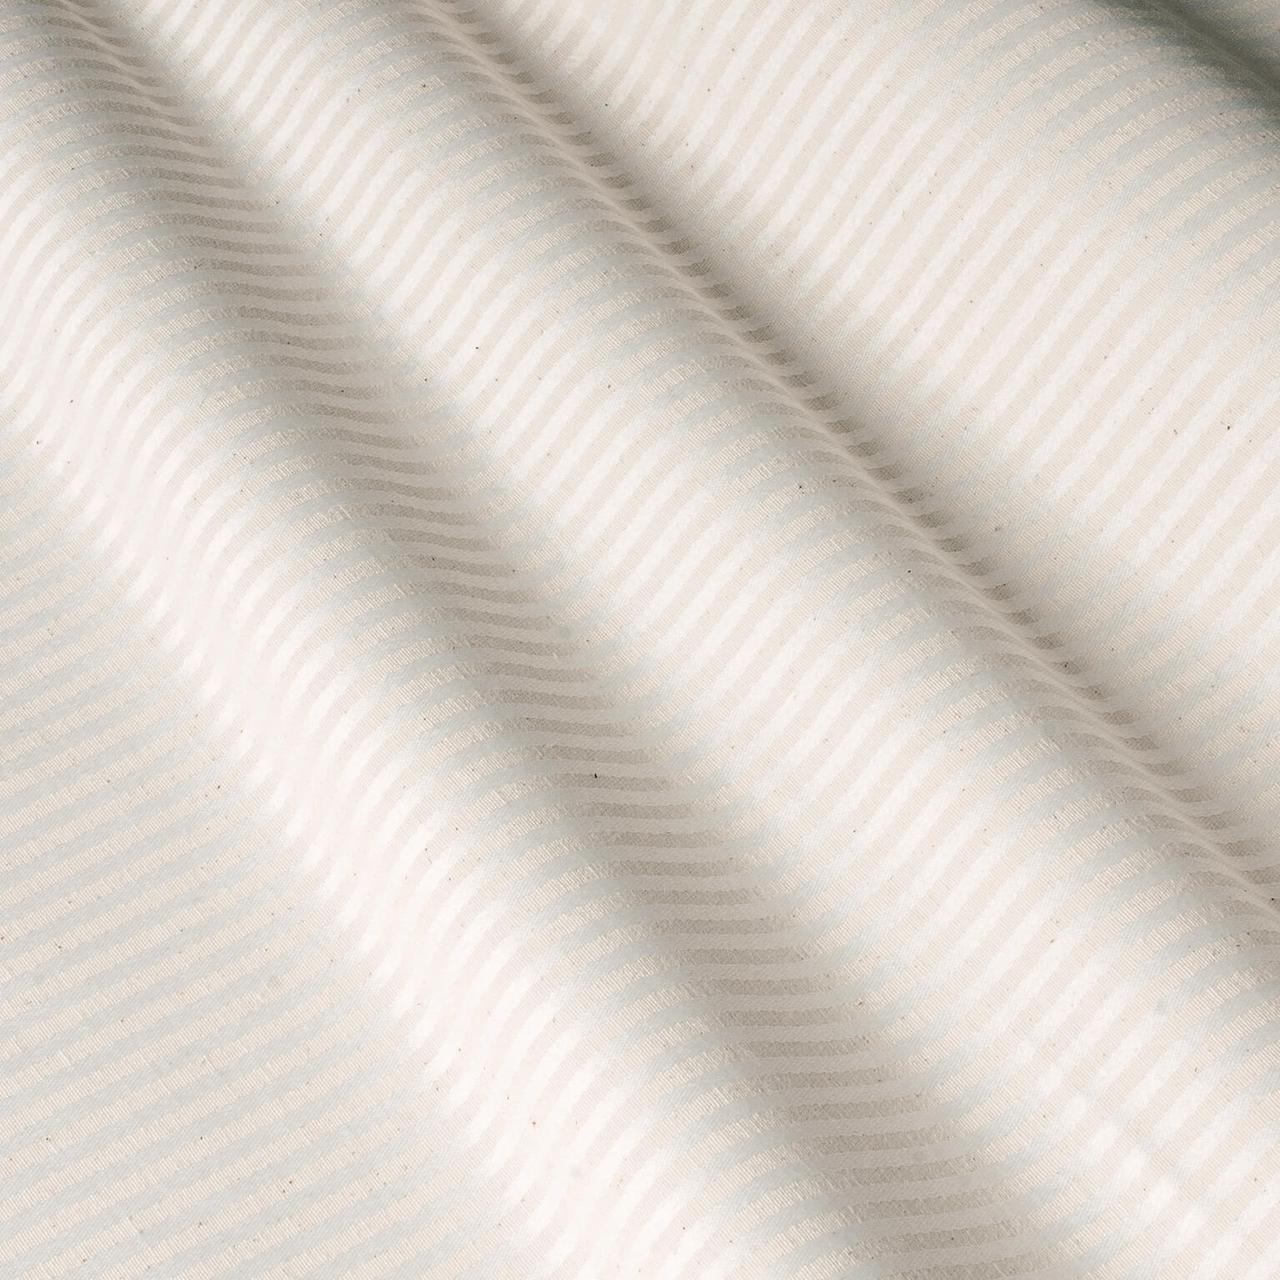 Ткань для скатертей и салфеток (ресторан) 400102 v1